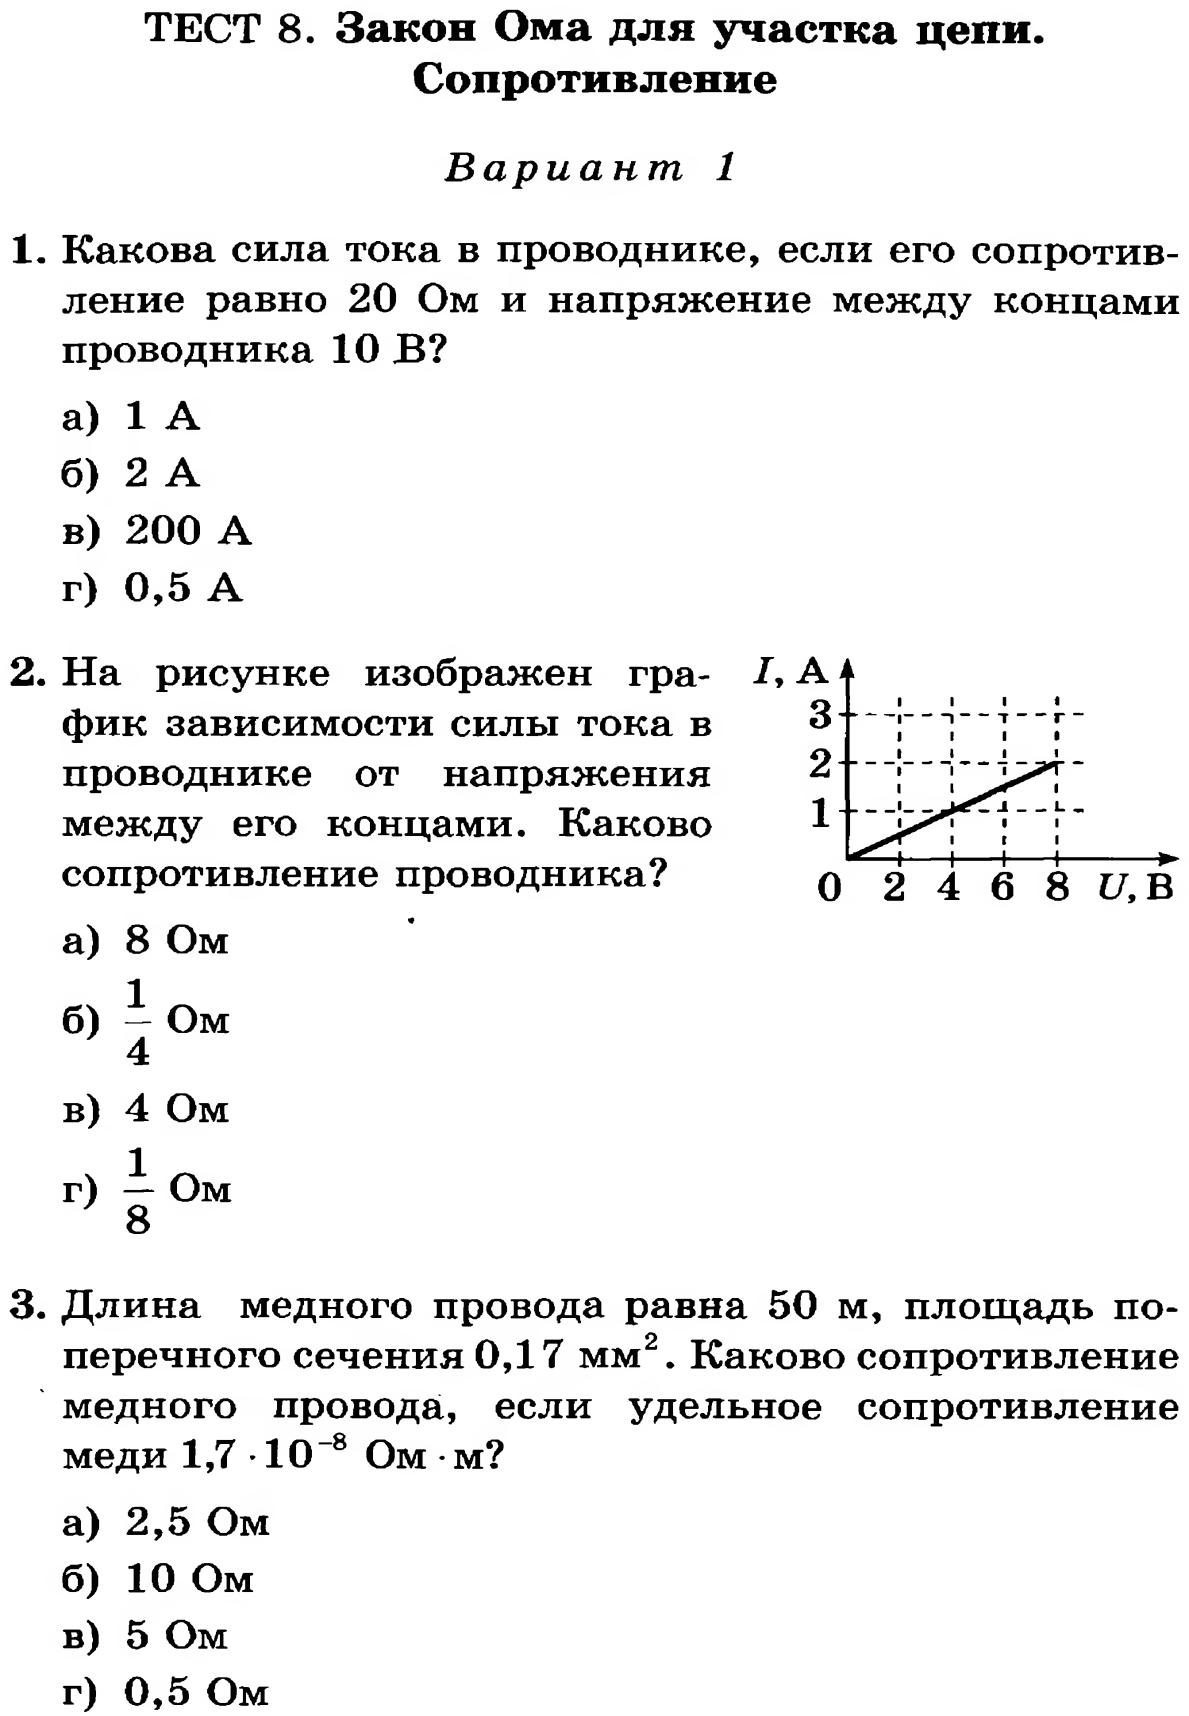 https://fsd.multiurok.ru/html/2018/03/13/s_5aa7a253057ba/857111_1.png